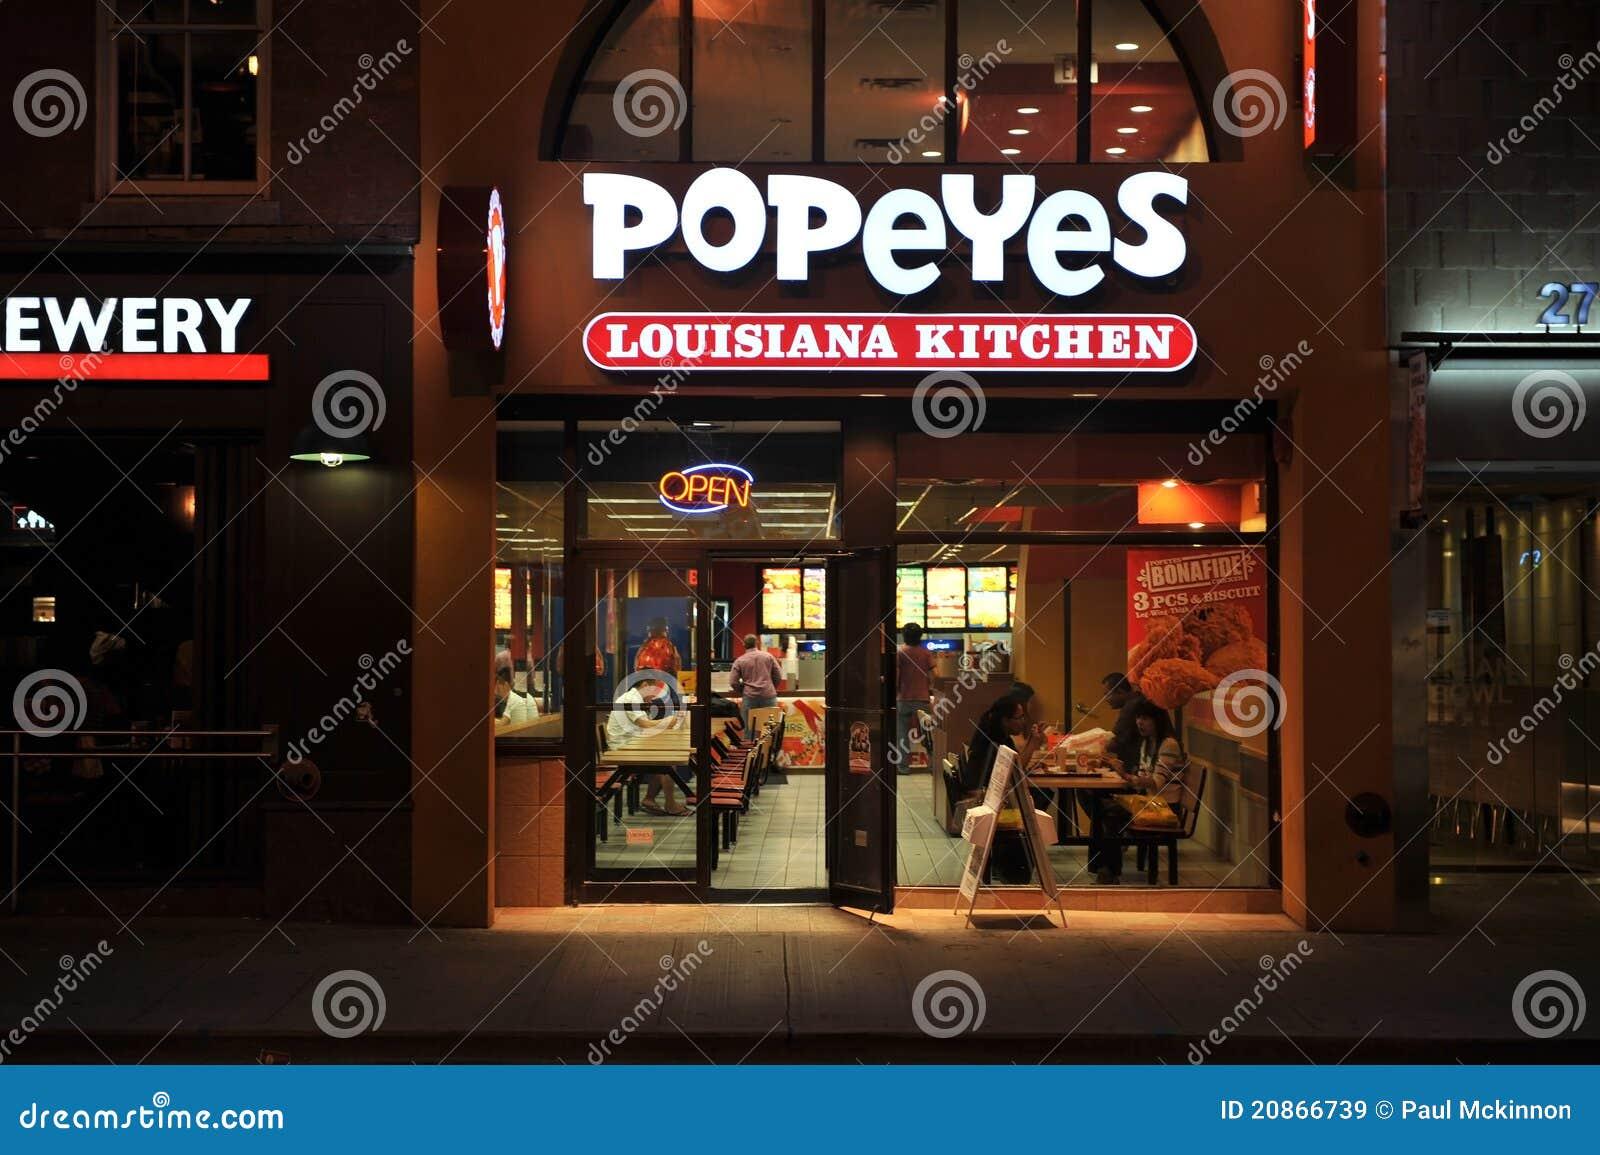 Popeyes Louisiana Kitchen Logo Vector popeye's louisiana kitchen editorial stock image - image: 20866739